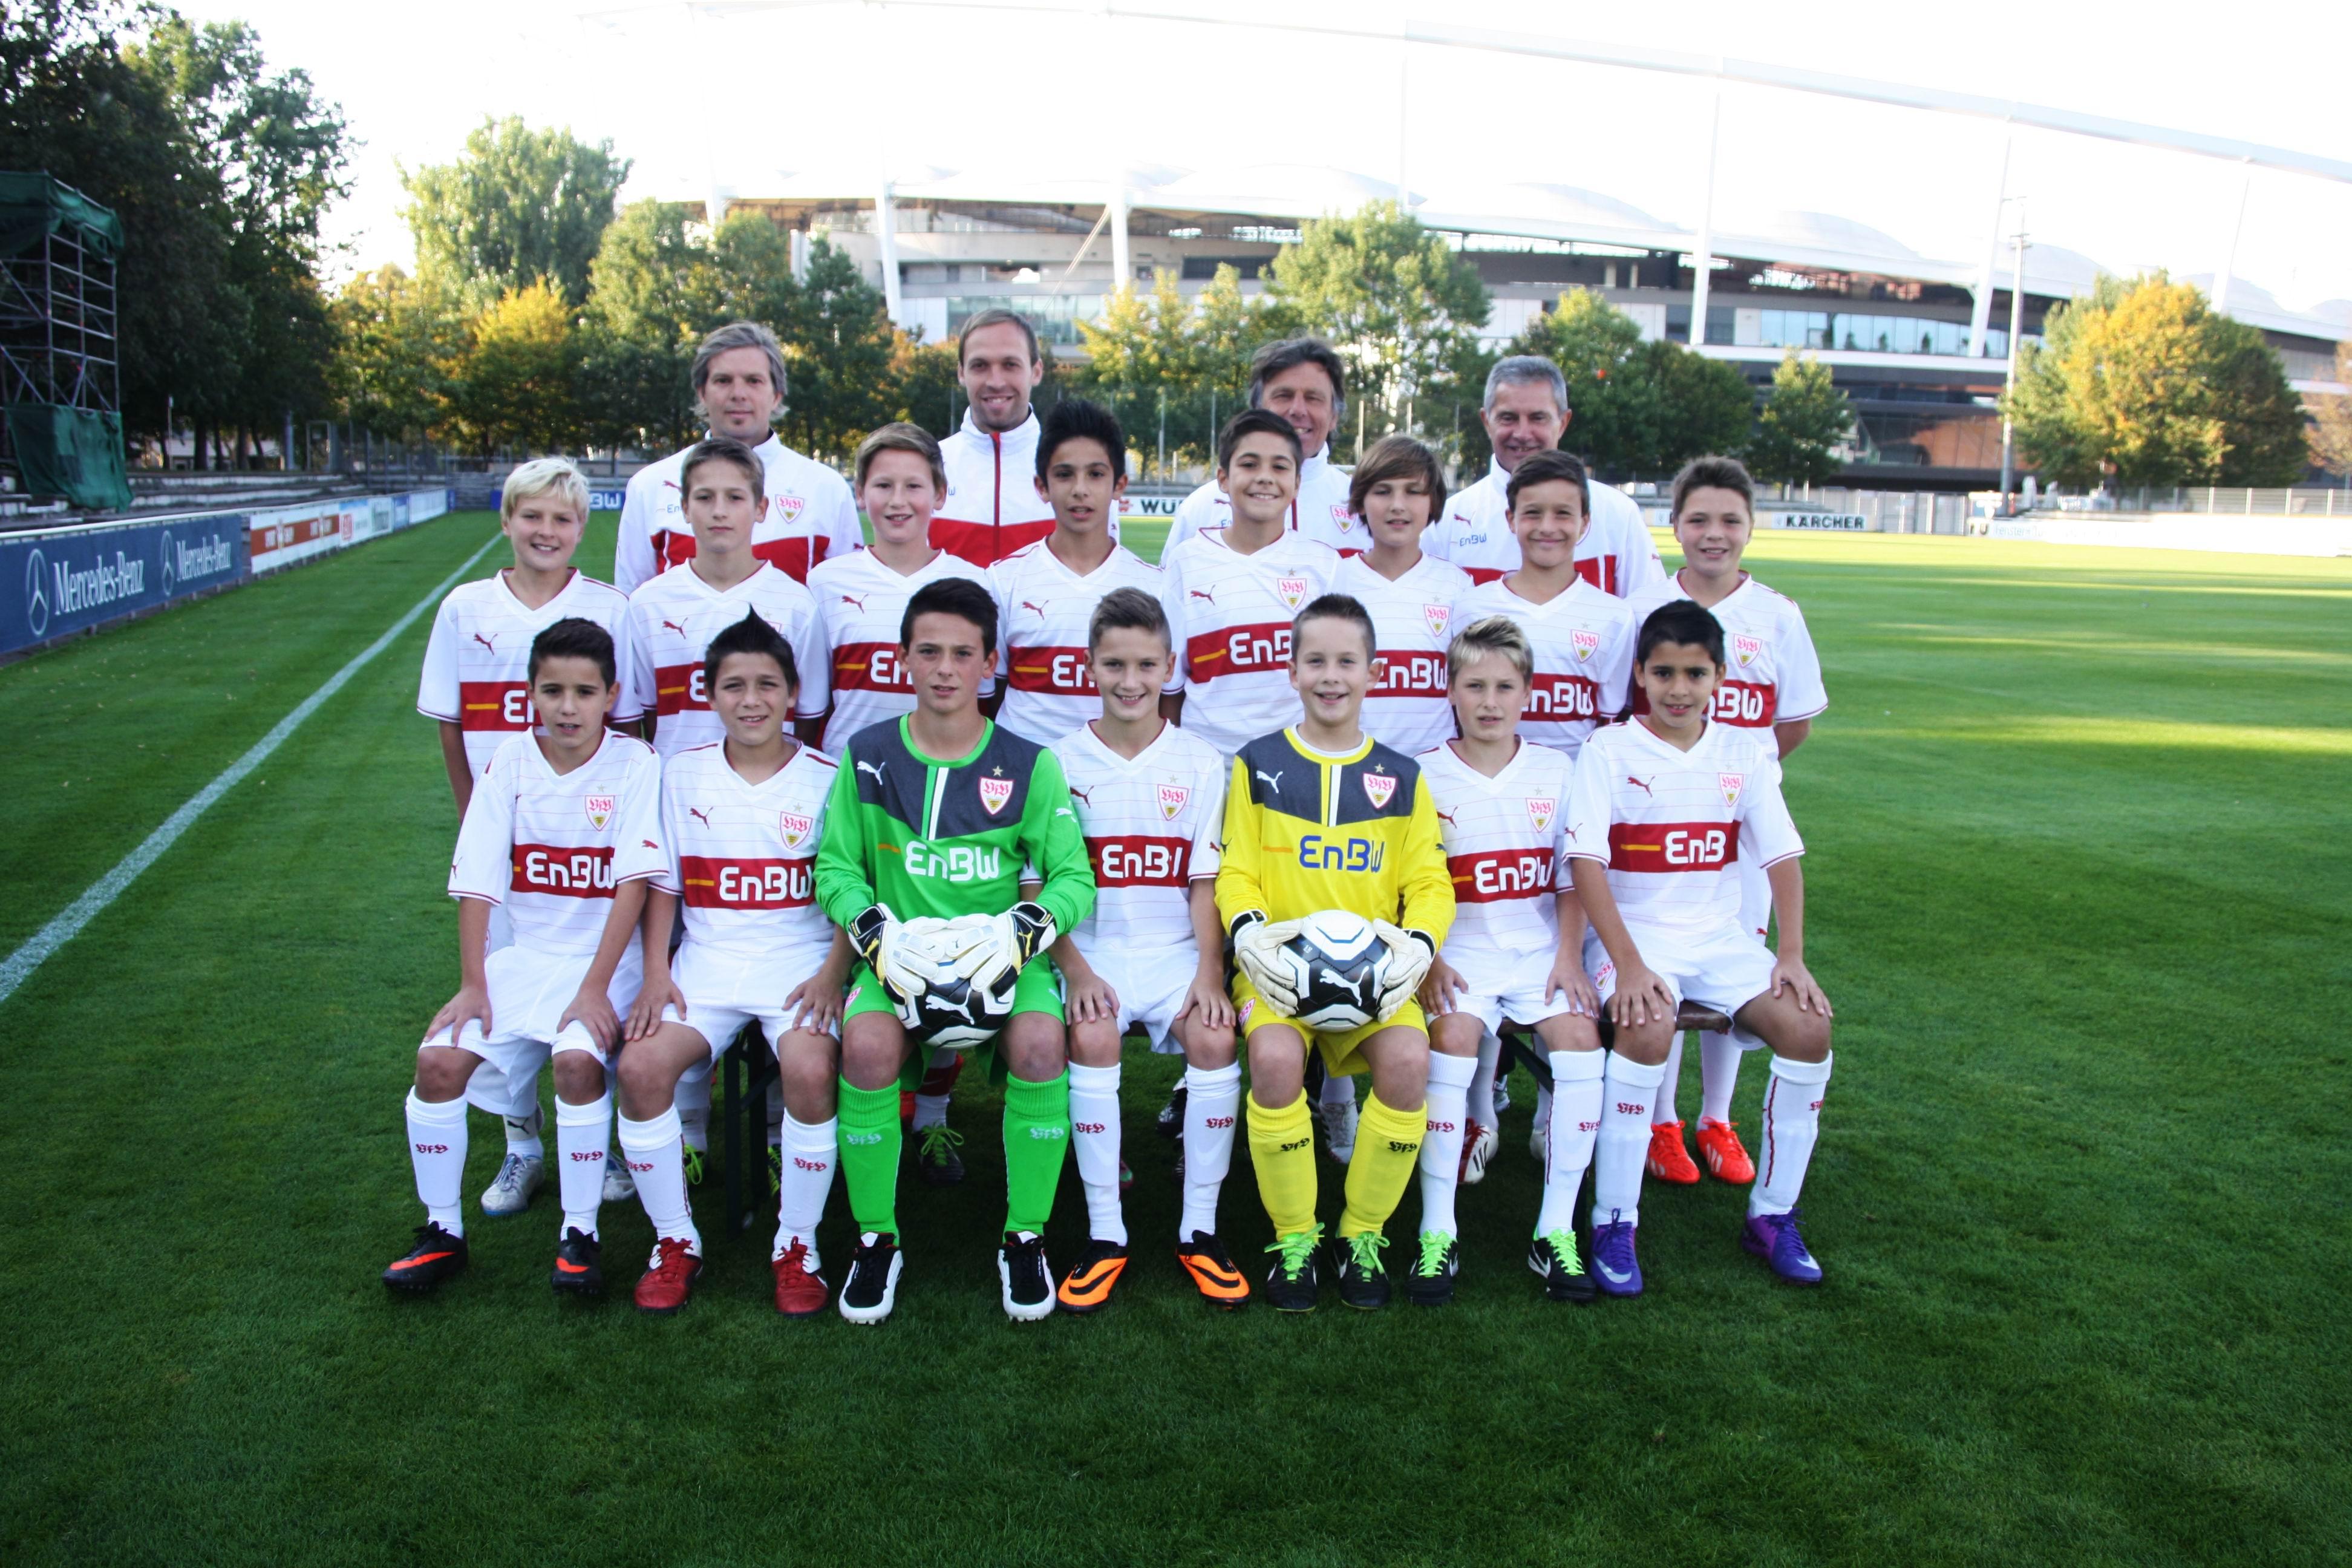 club 188 frankfurt beschnitten schwanz